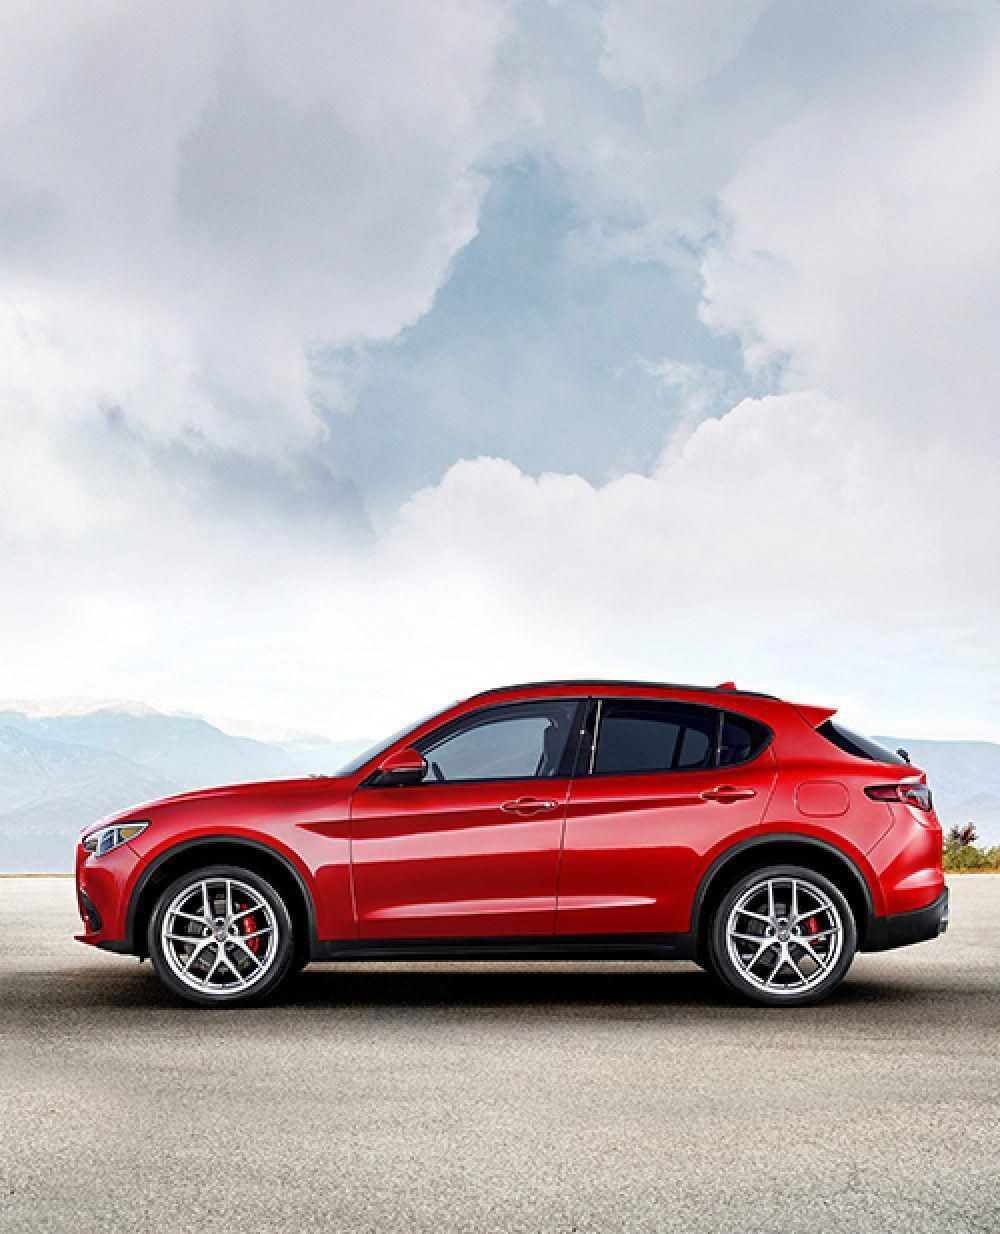 A Profile View Of The 2019 Alfa Romeo Stelvio Alfaromeo Alfa Romeo Stelvio Alfa Romeo Luxury Suv